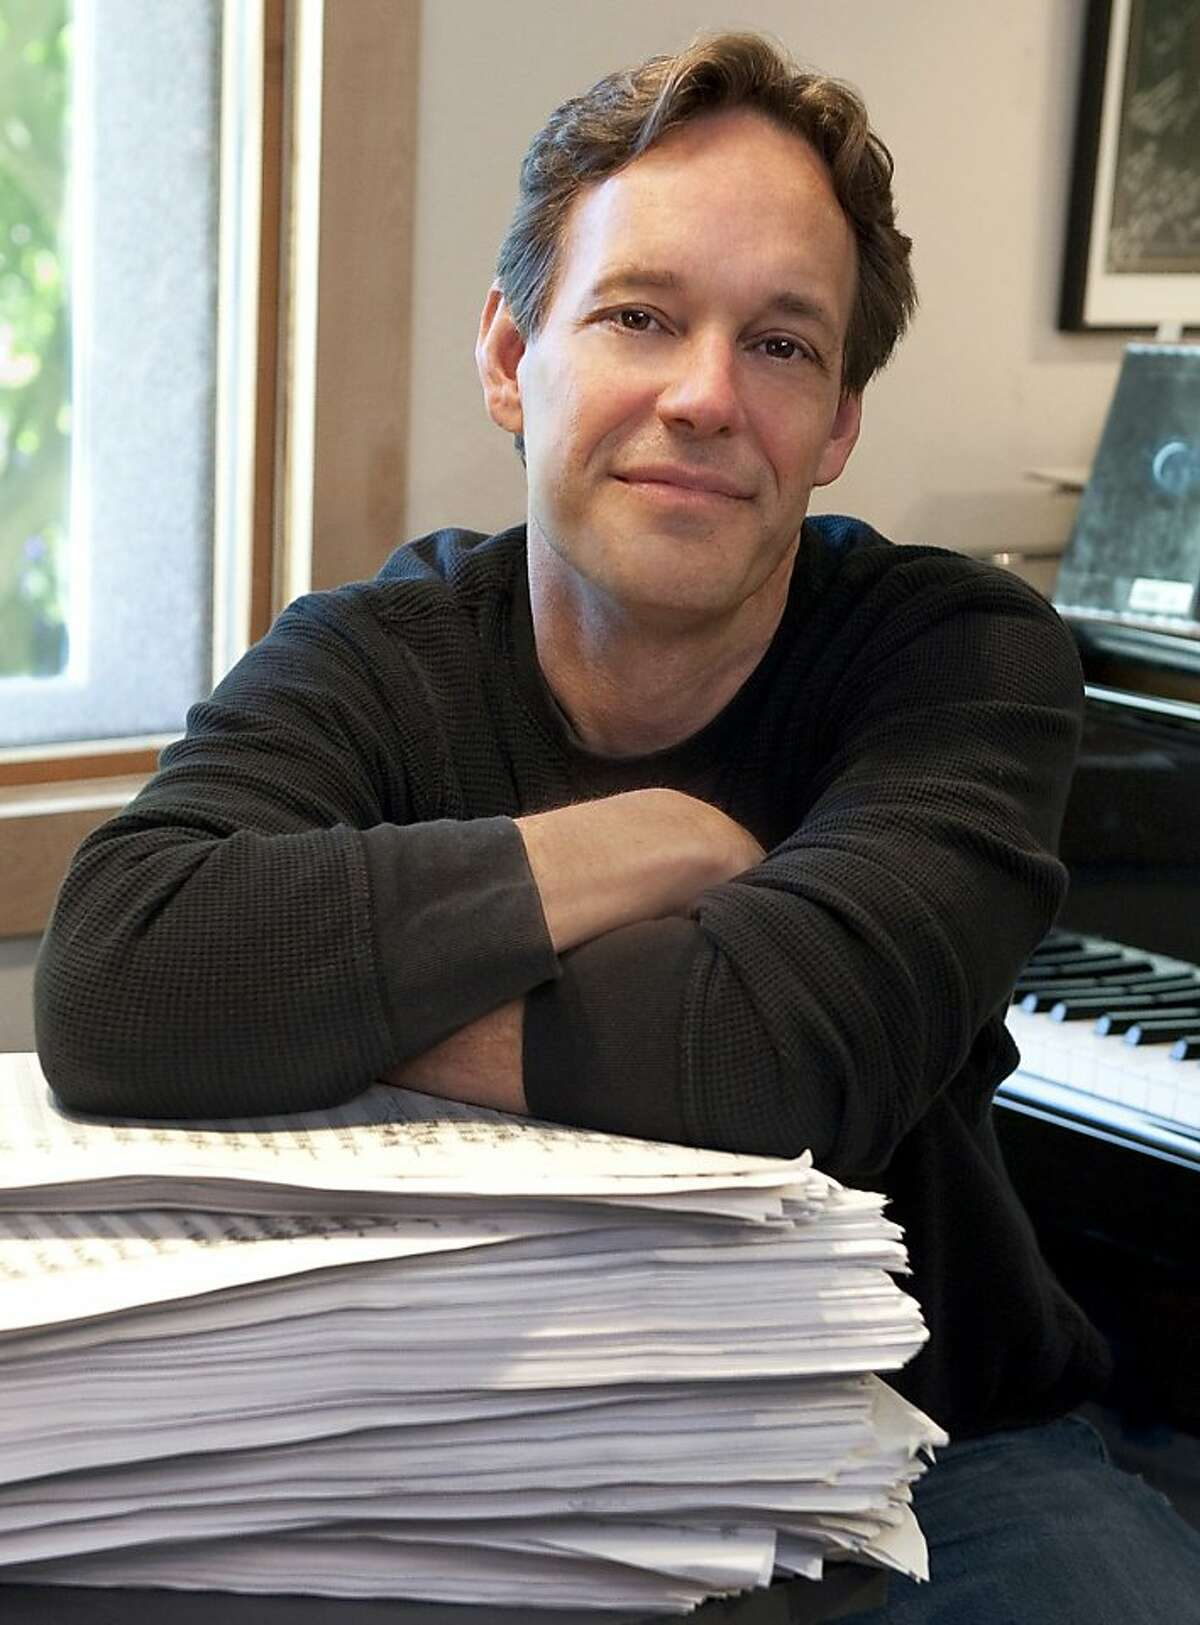 Composer Jake Heggie